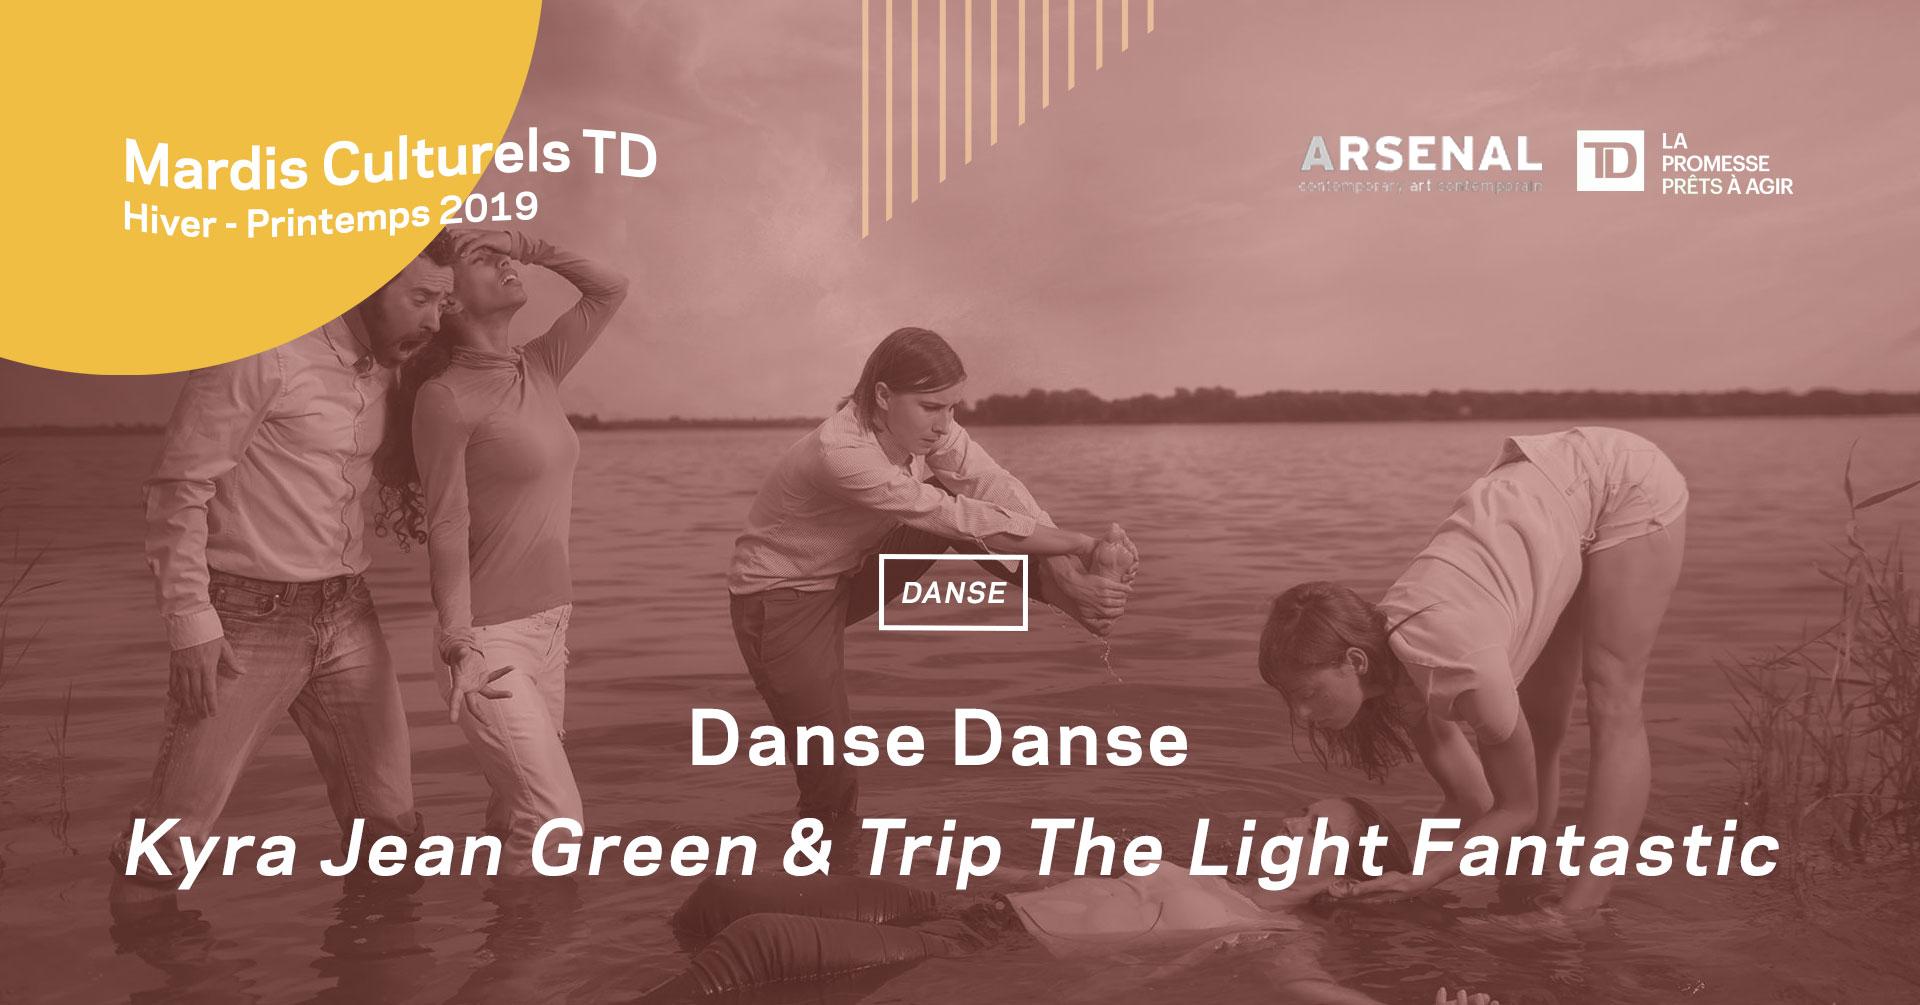 mctd-kyra-jean-green-trip-the-light-fantastic.jpg